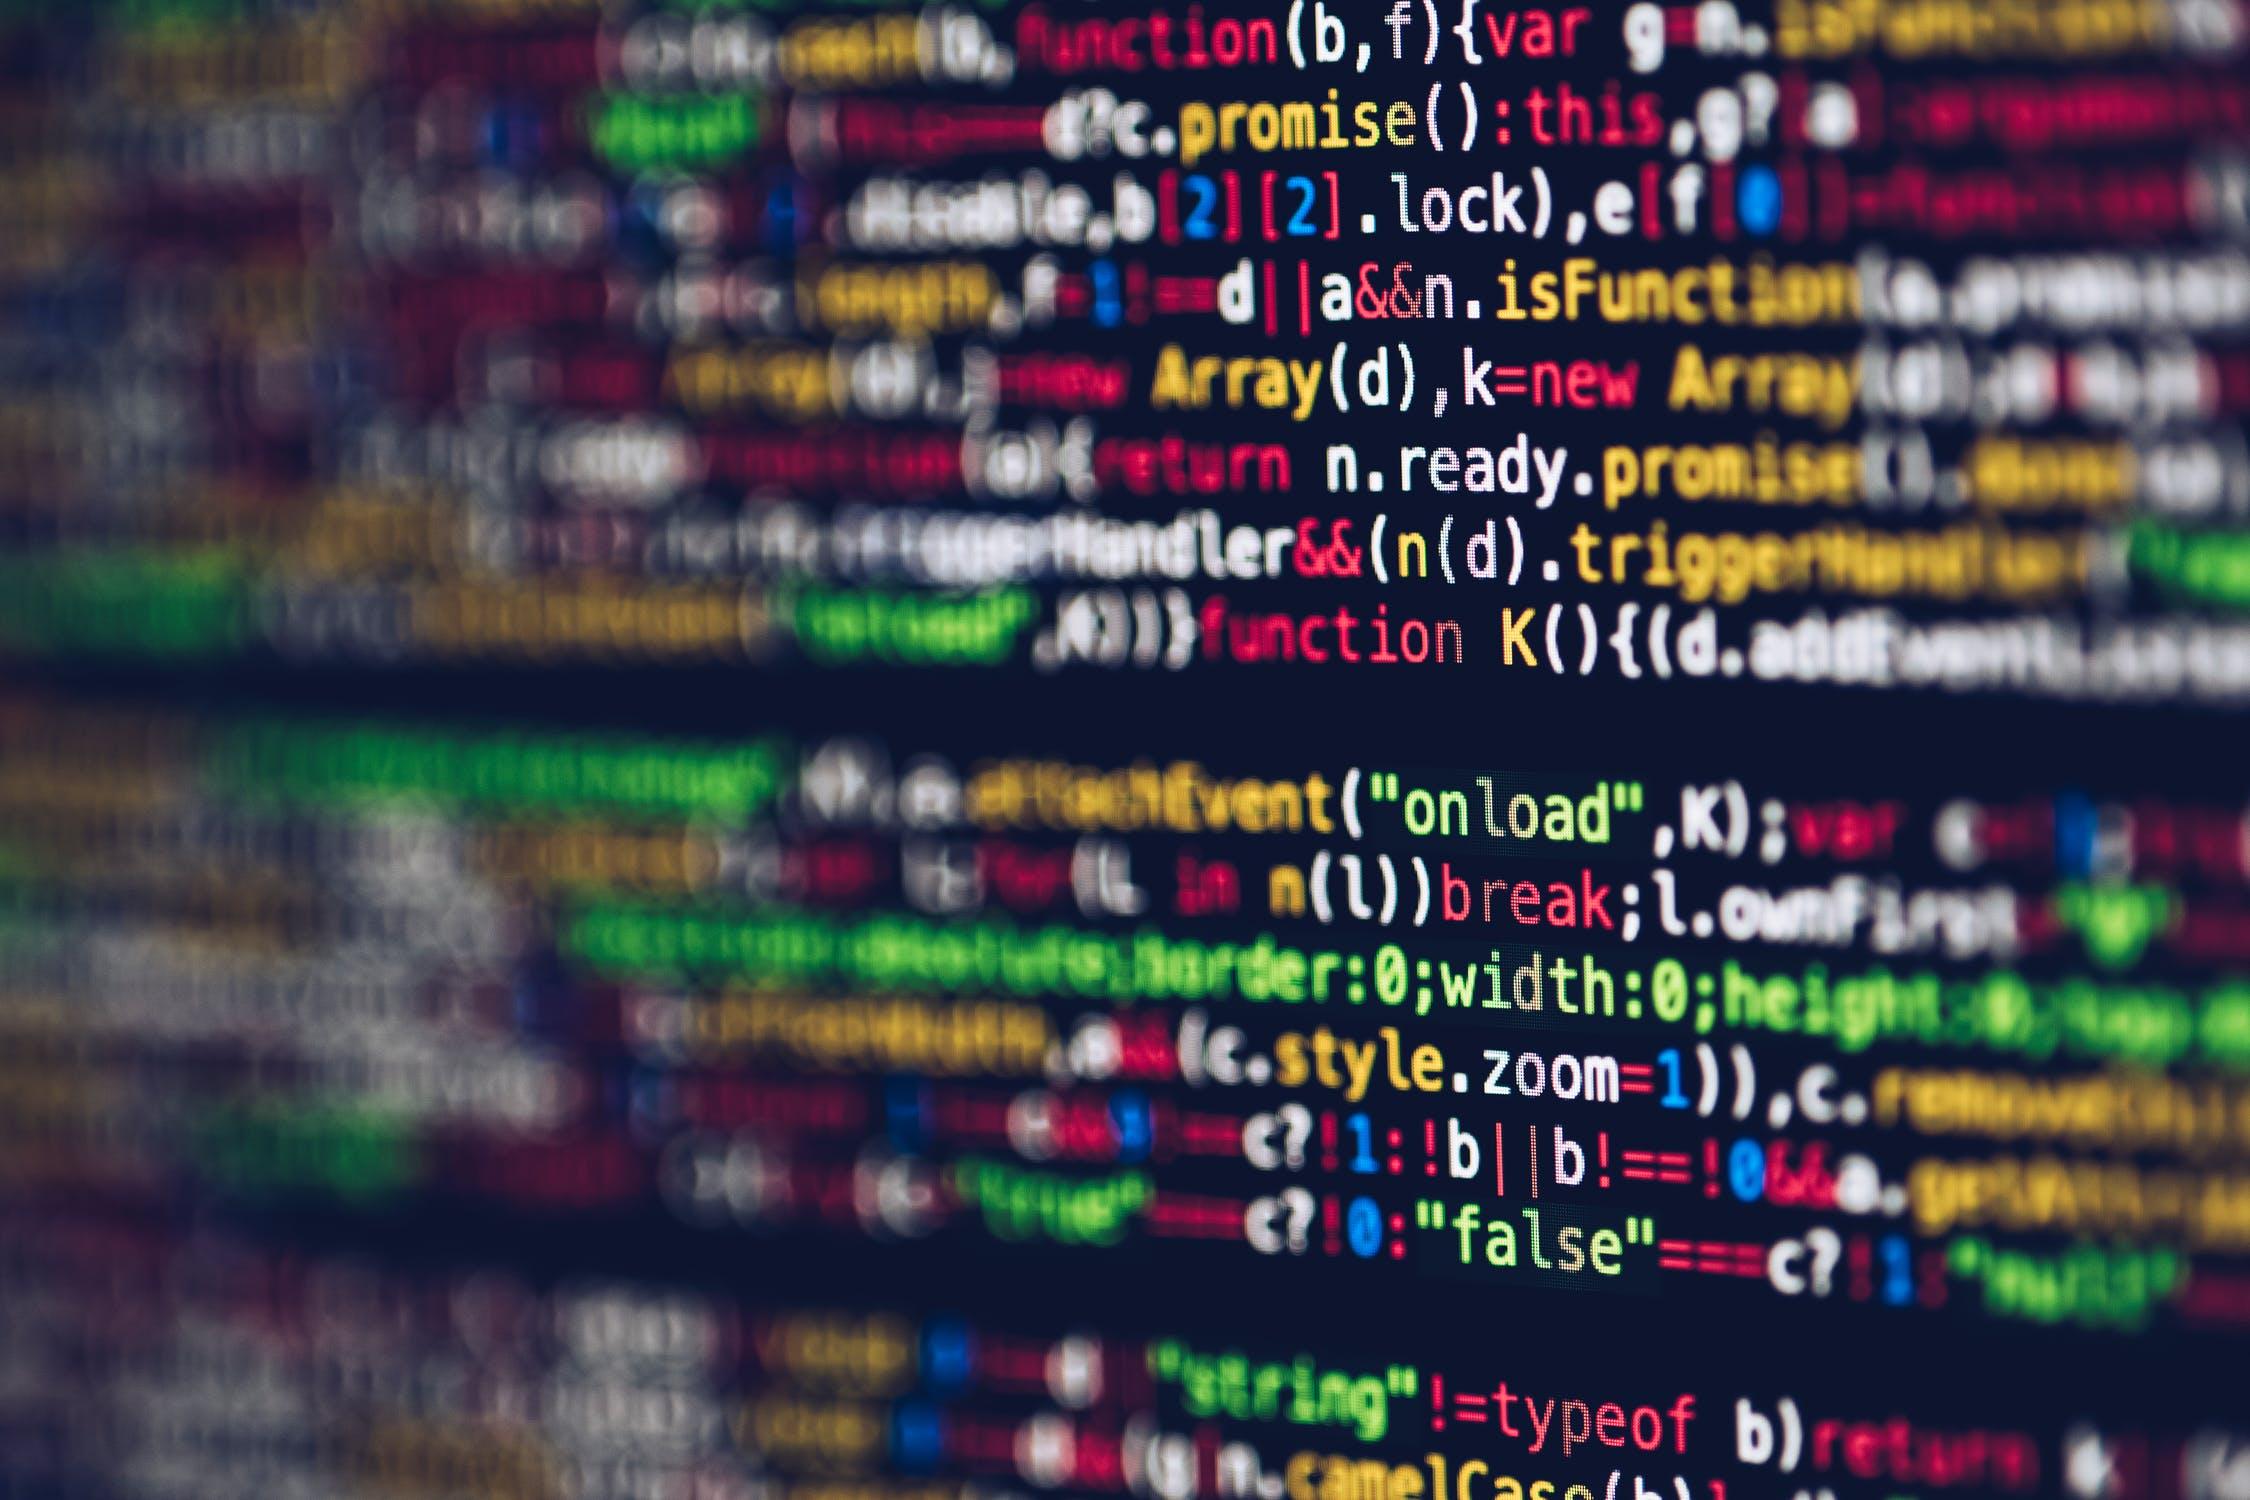 apa itu bahasa pemrograman c, Apa Itu Bahasa Pemrograman C atau C#, Advance Innovations